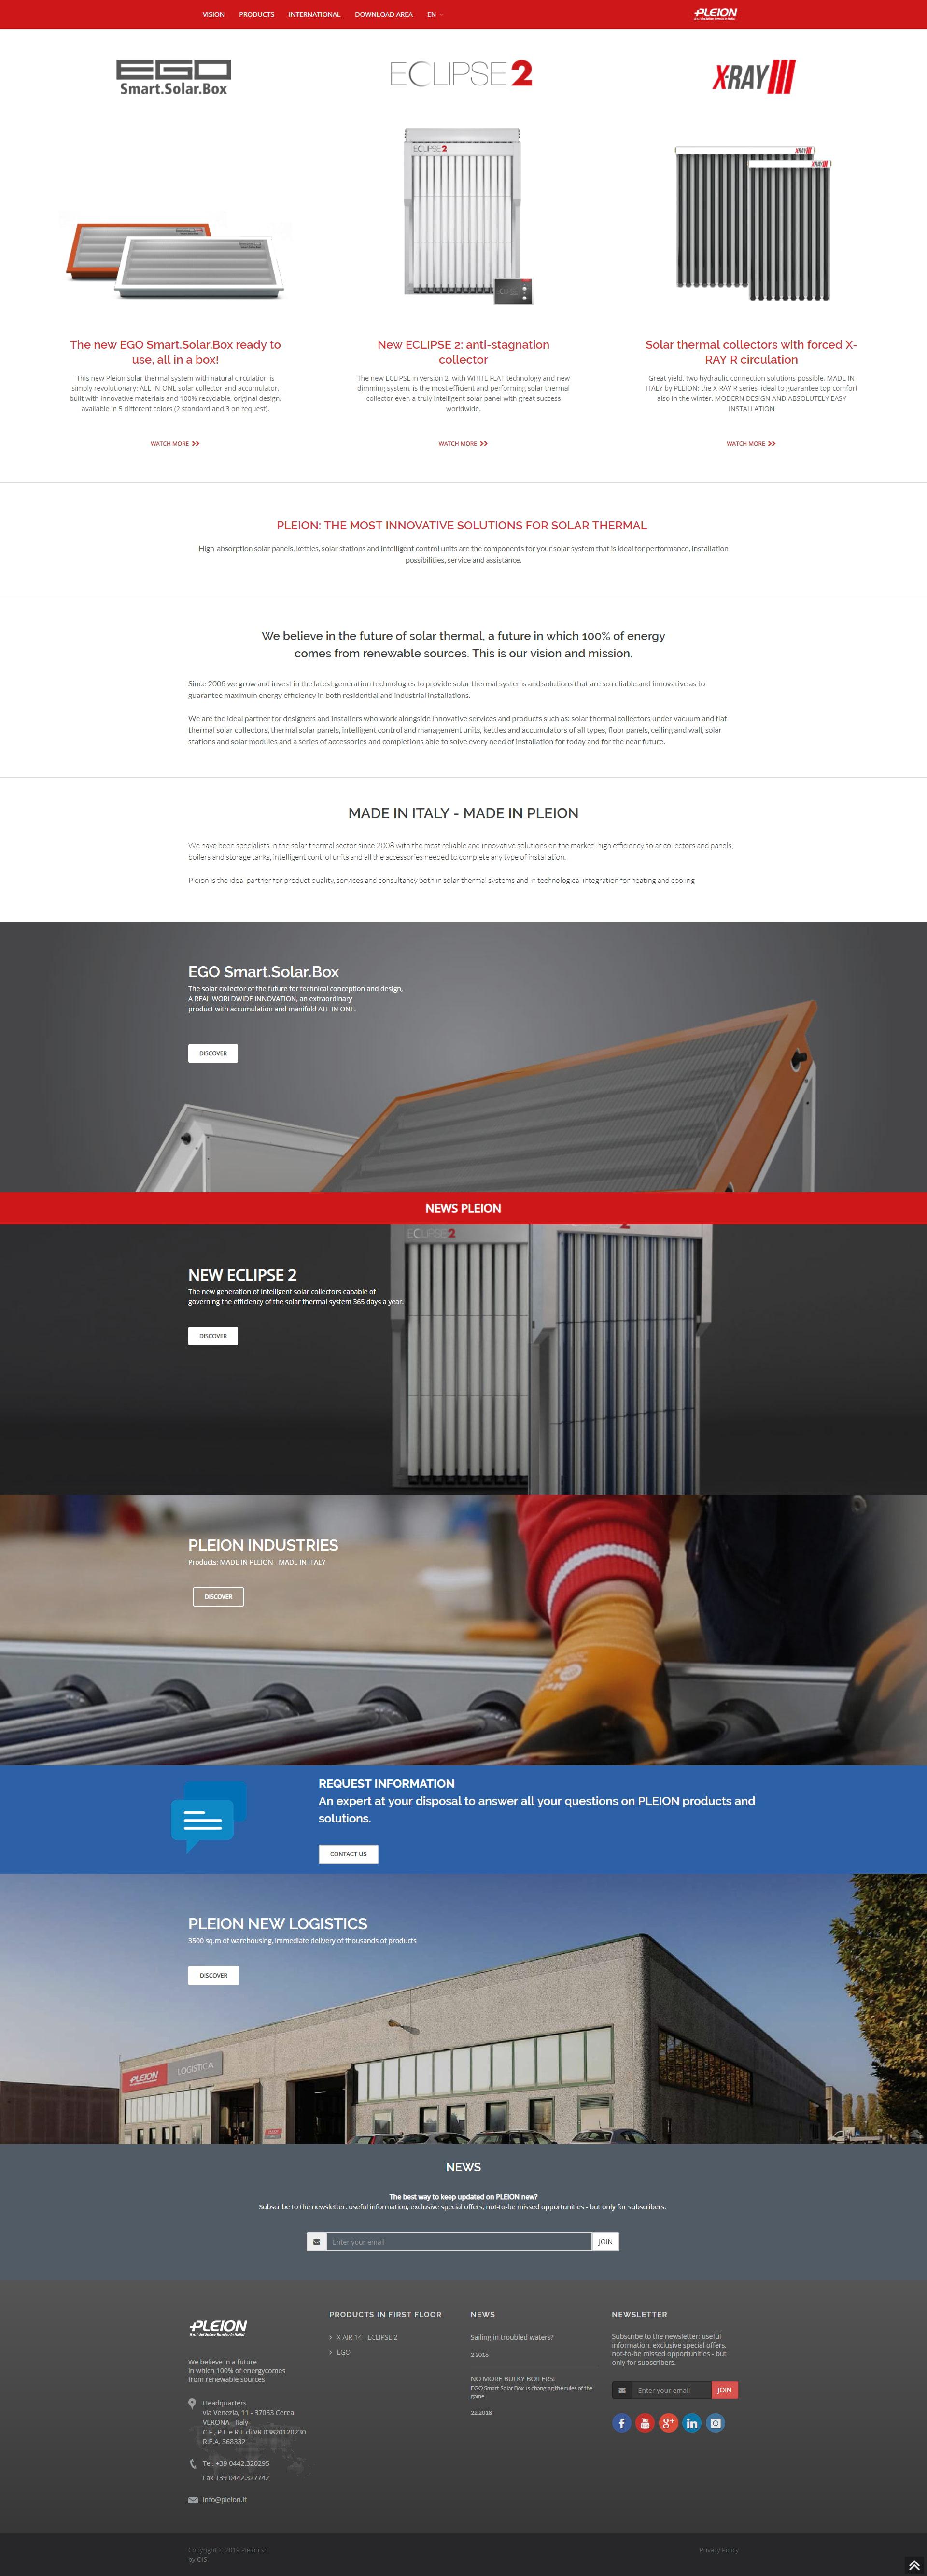 Web Agency Verona - Web Design, Web Development - Pleion S.r.l | OIS